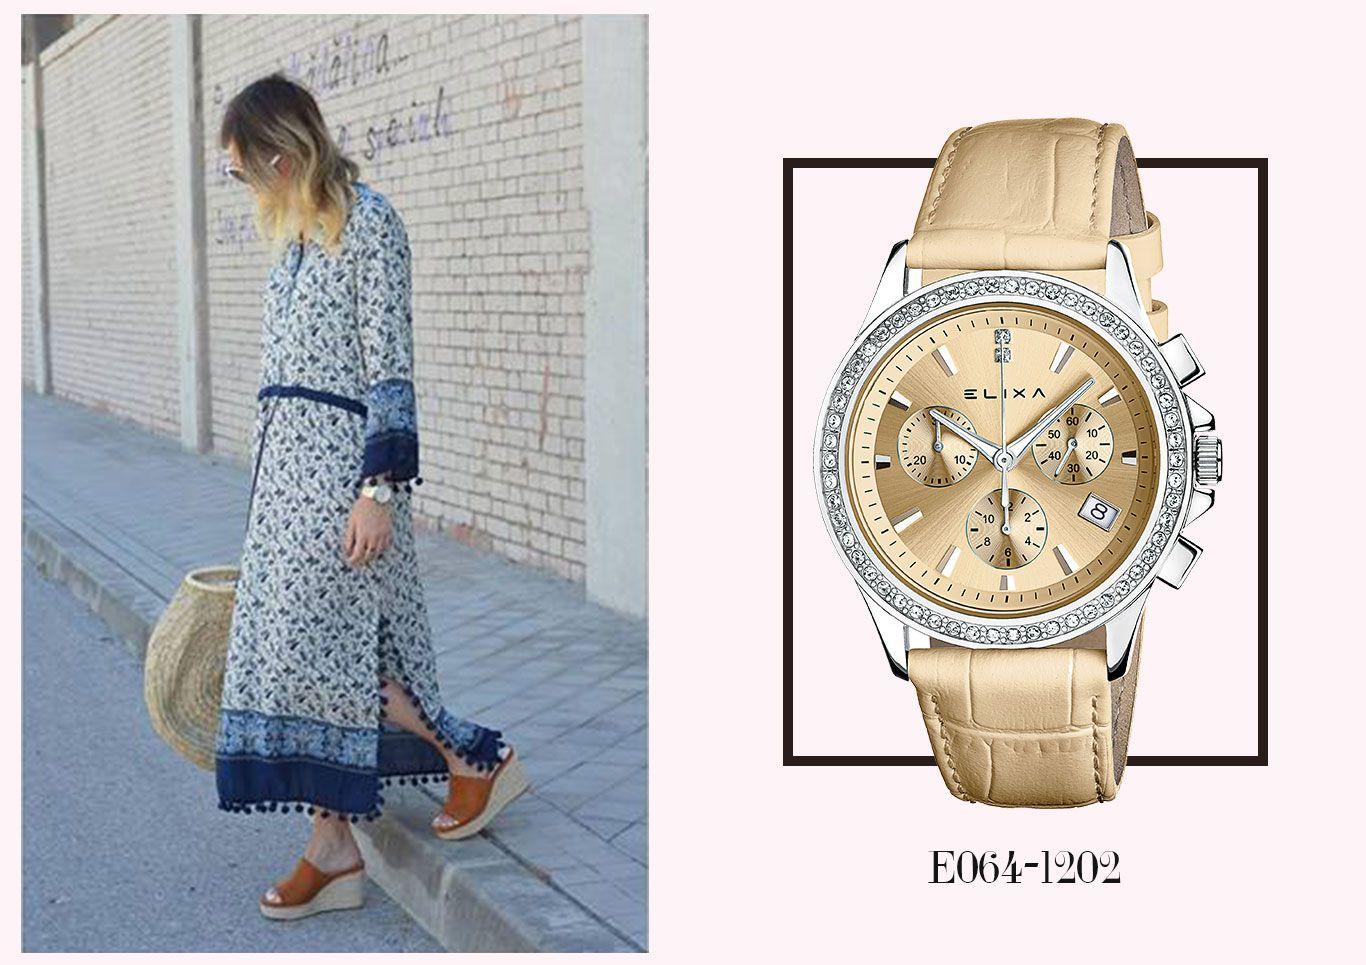 Đồng hồ Elixa E064-l202